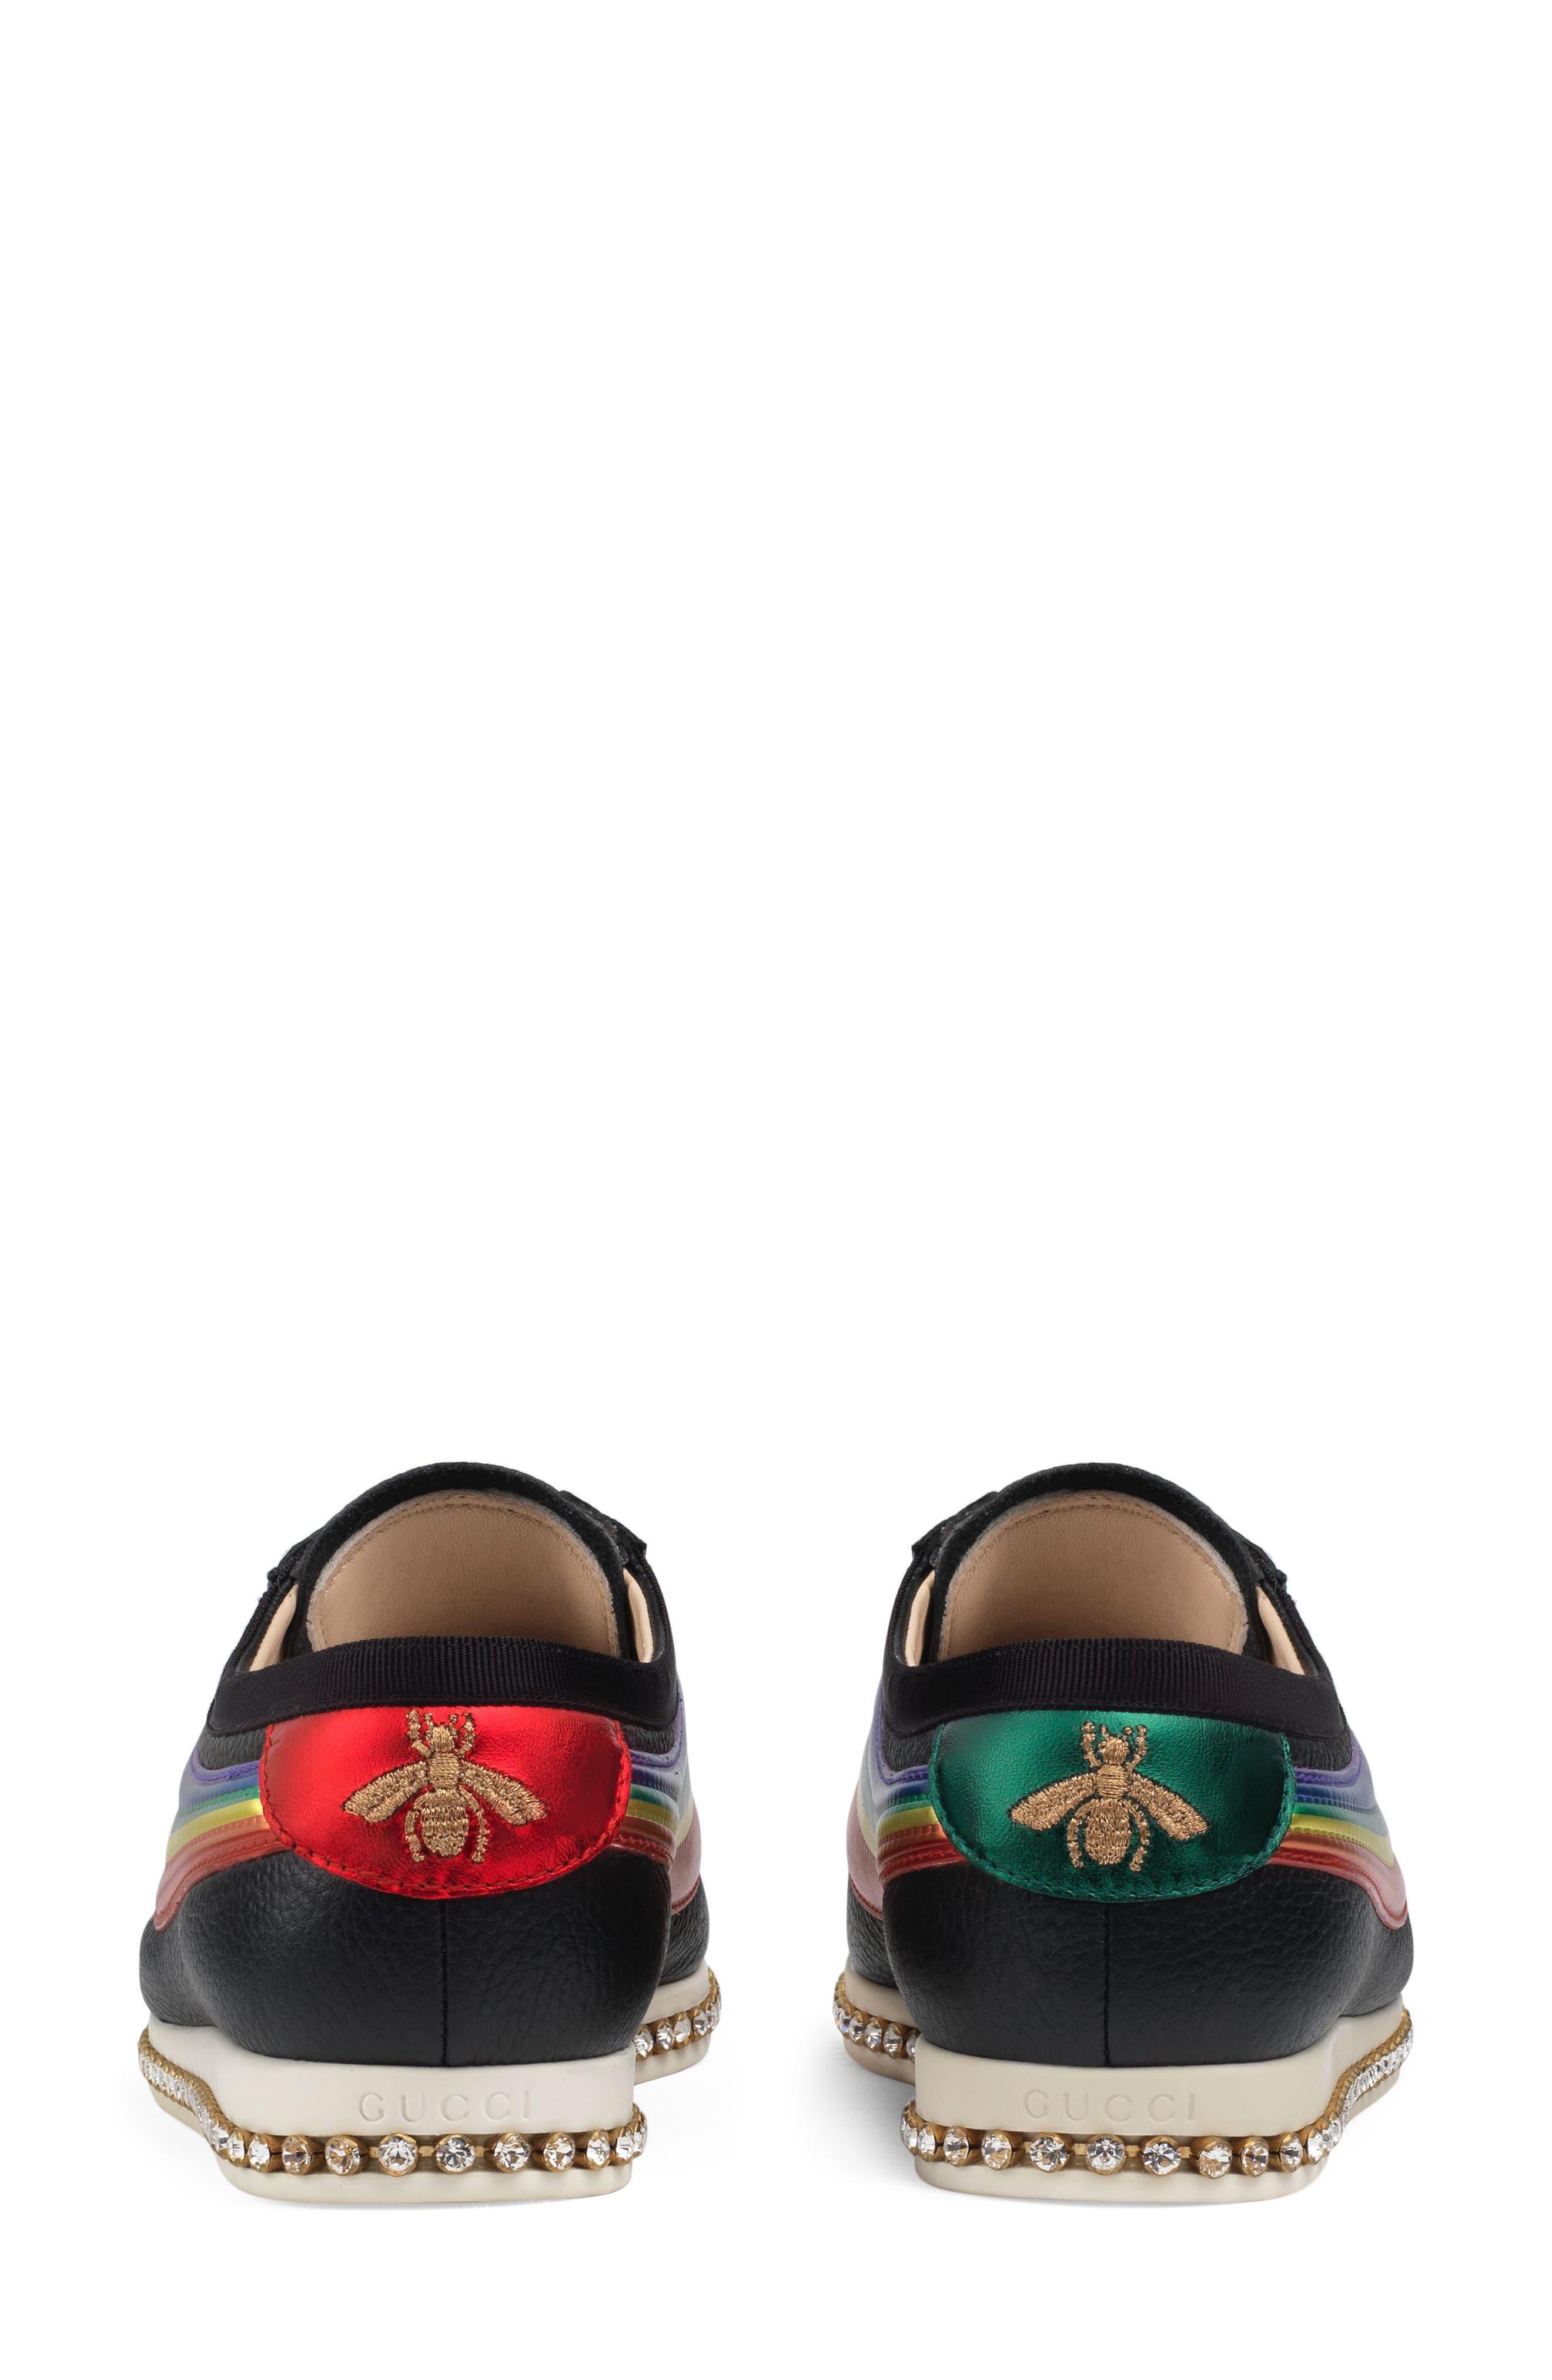 Falacer Sneaker,                             Alternate thumbnail 4, color,                             Black